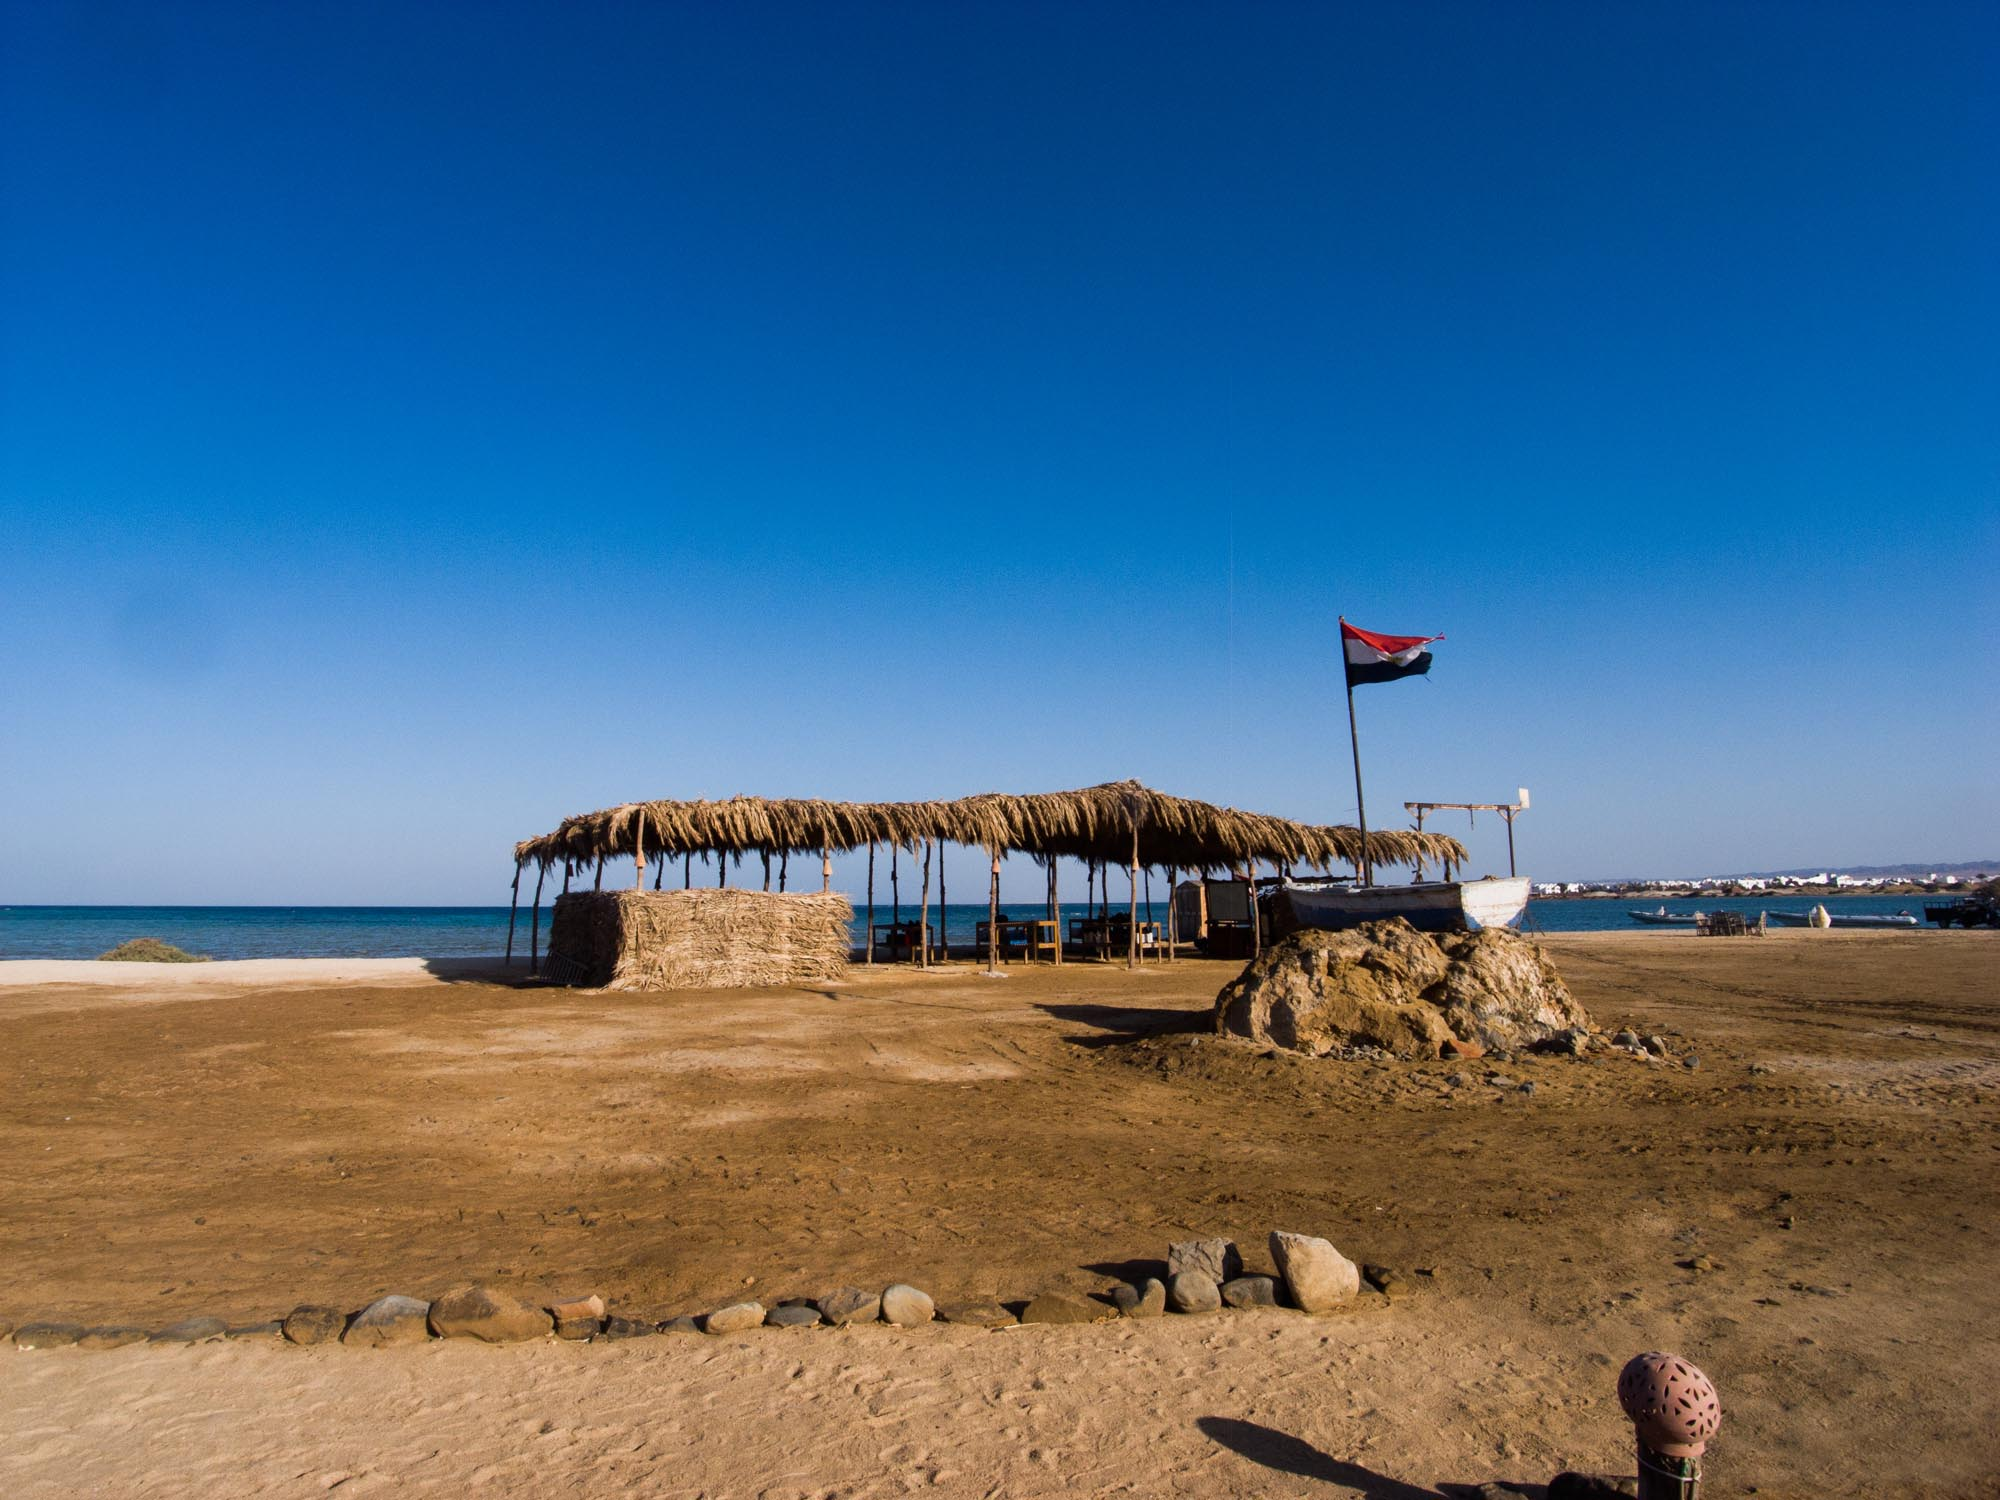 Lahami_Bay_Rotes_Meer_Red Sea Diving Safari_-22